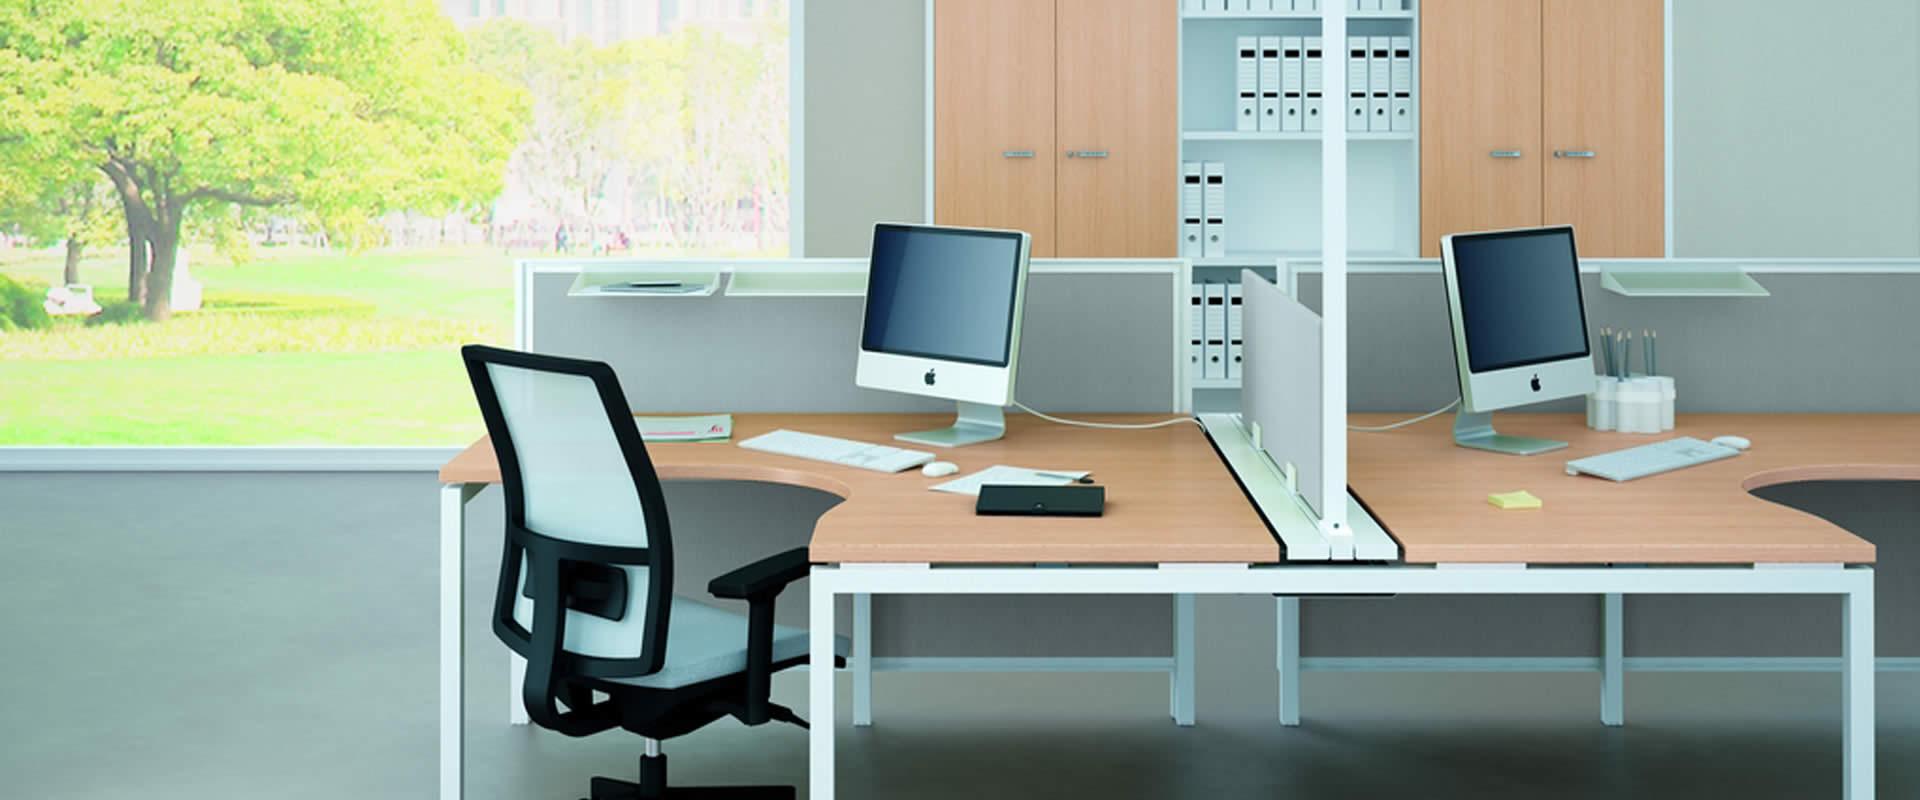 01-slide-oficinas-ideal